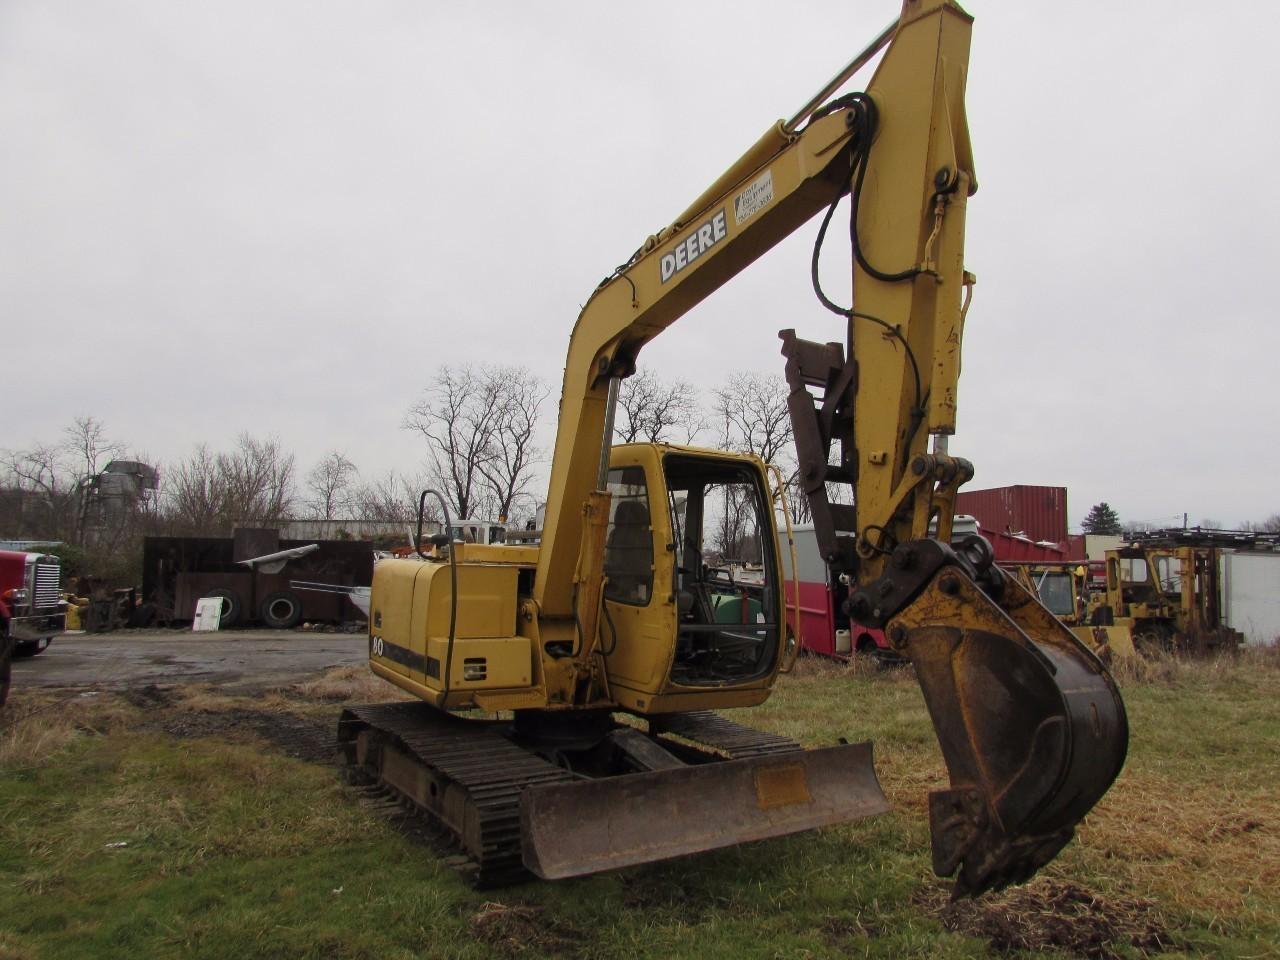 John Deere 80 Midi Excavator, Mount Pleasant PA ...